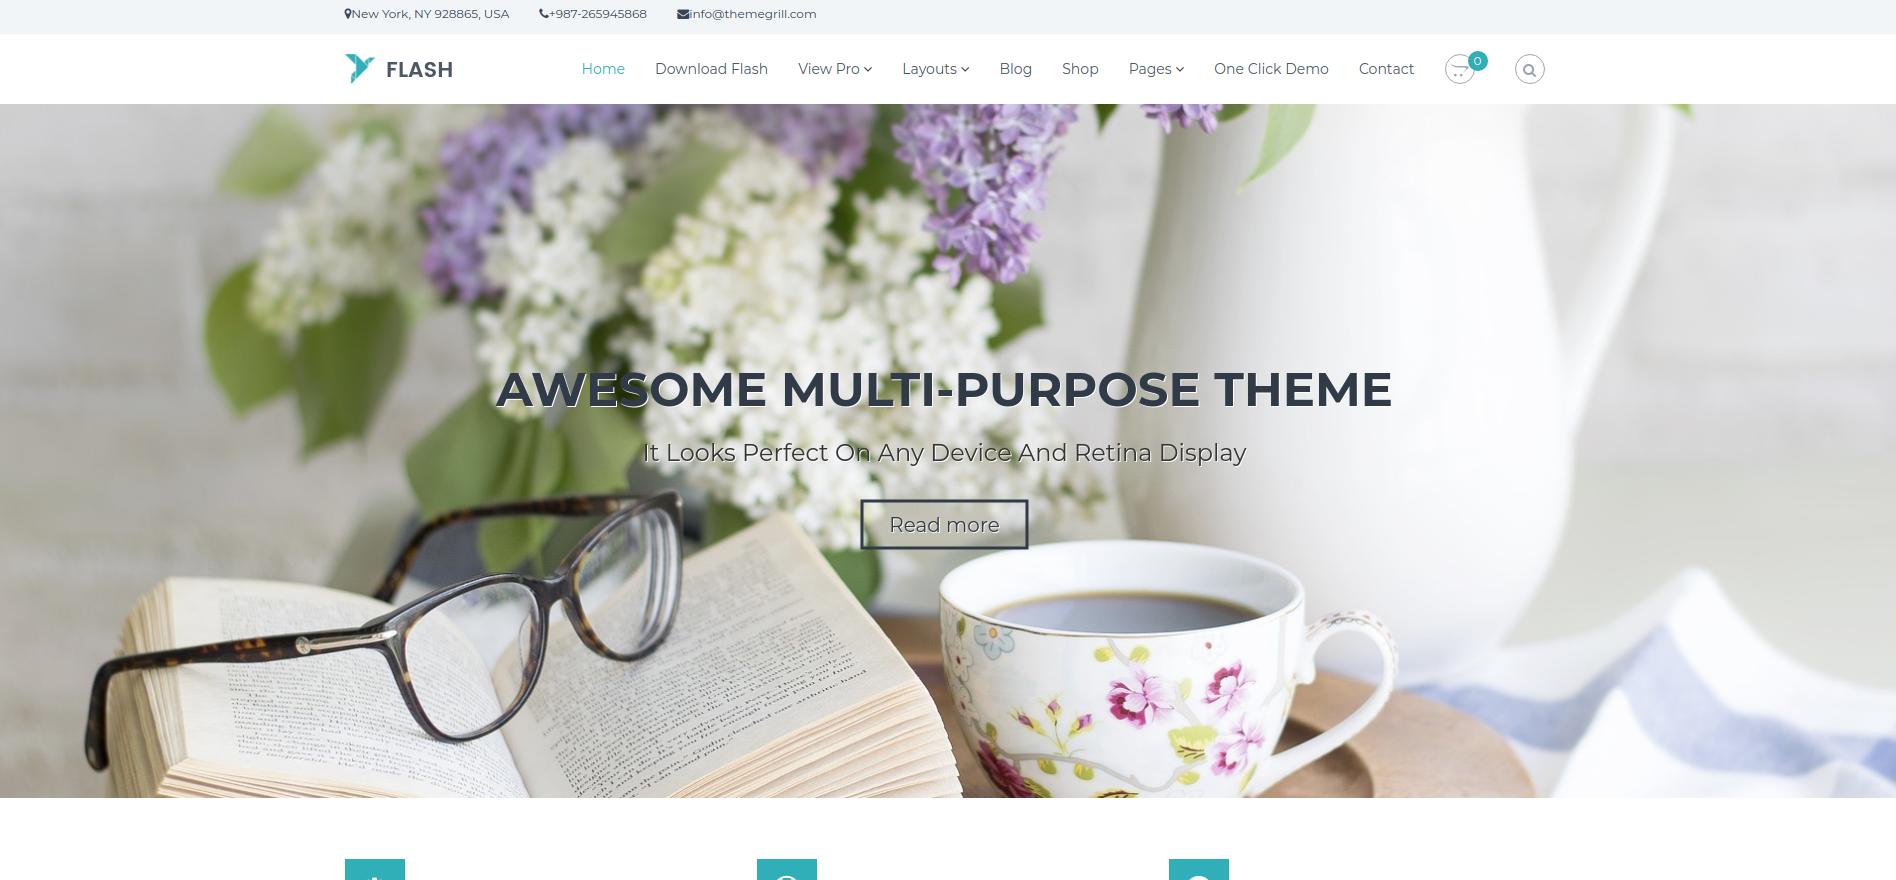 WordPress Themes : Flash